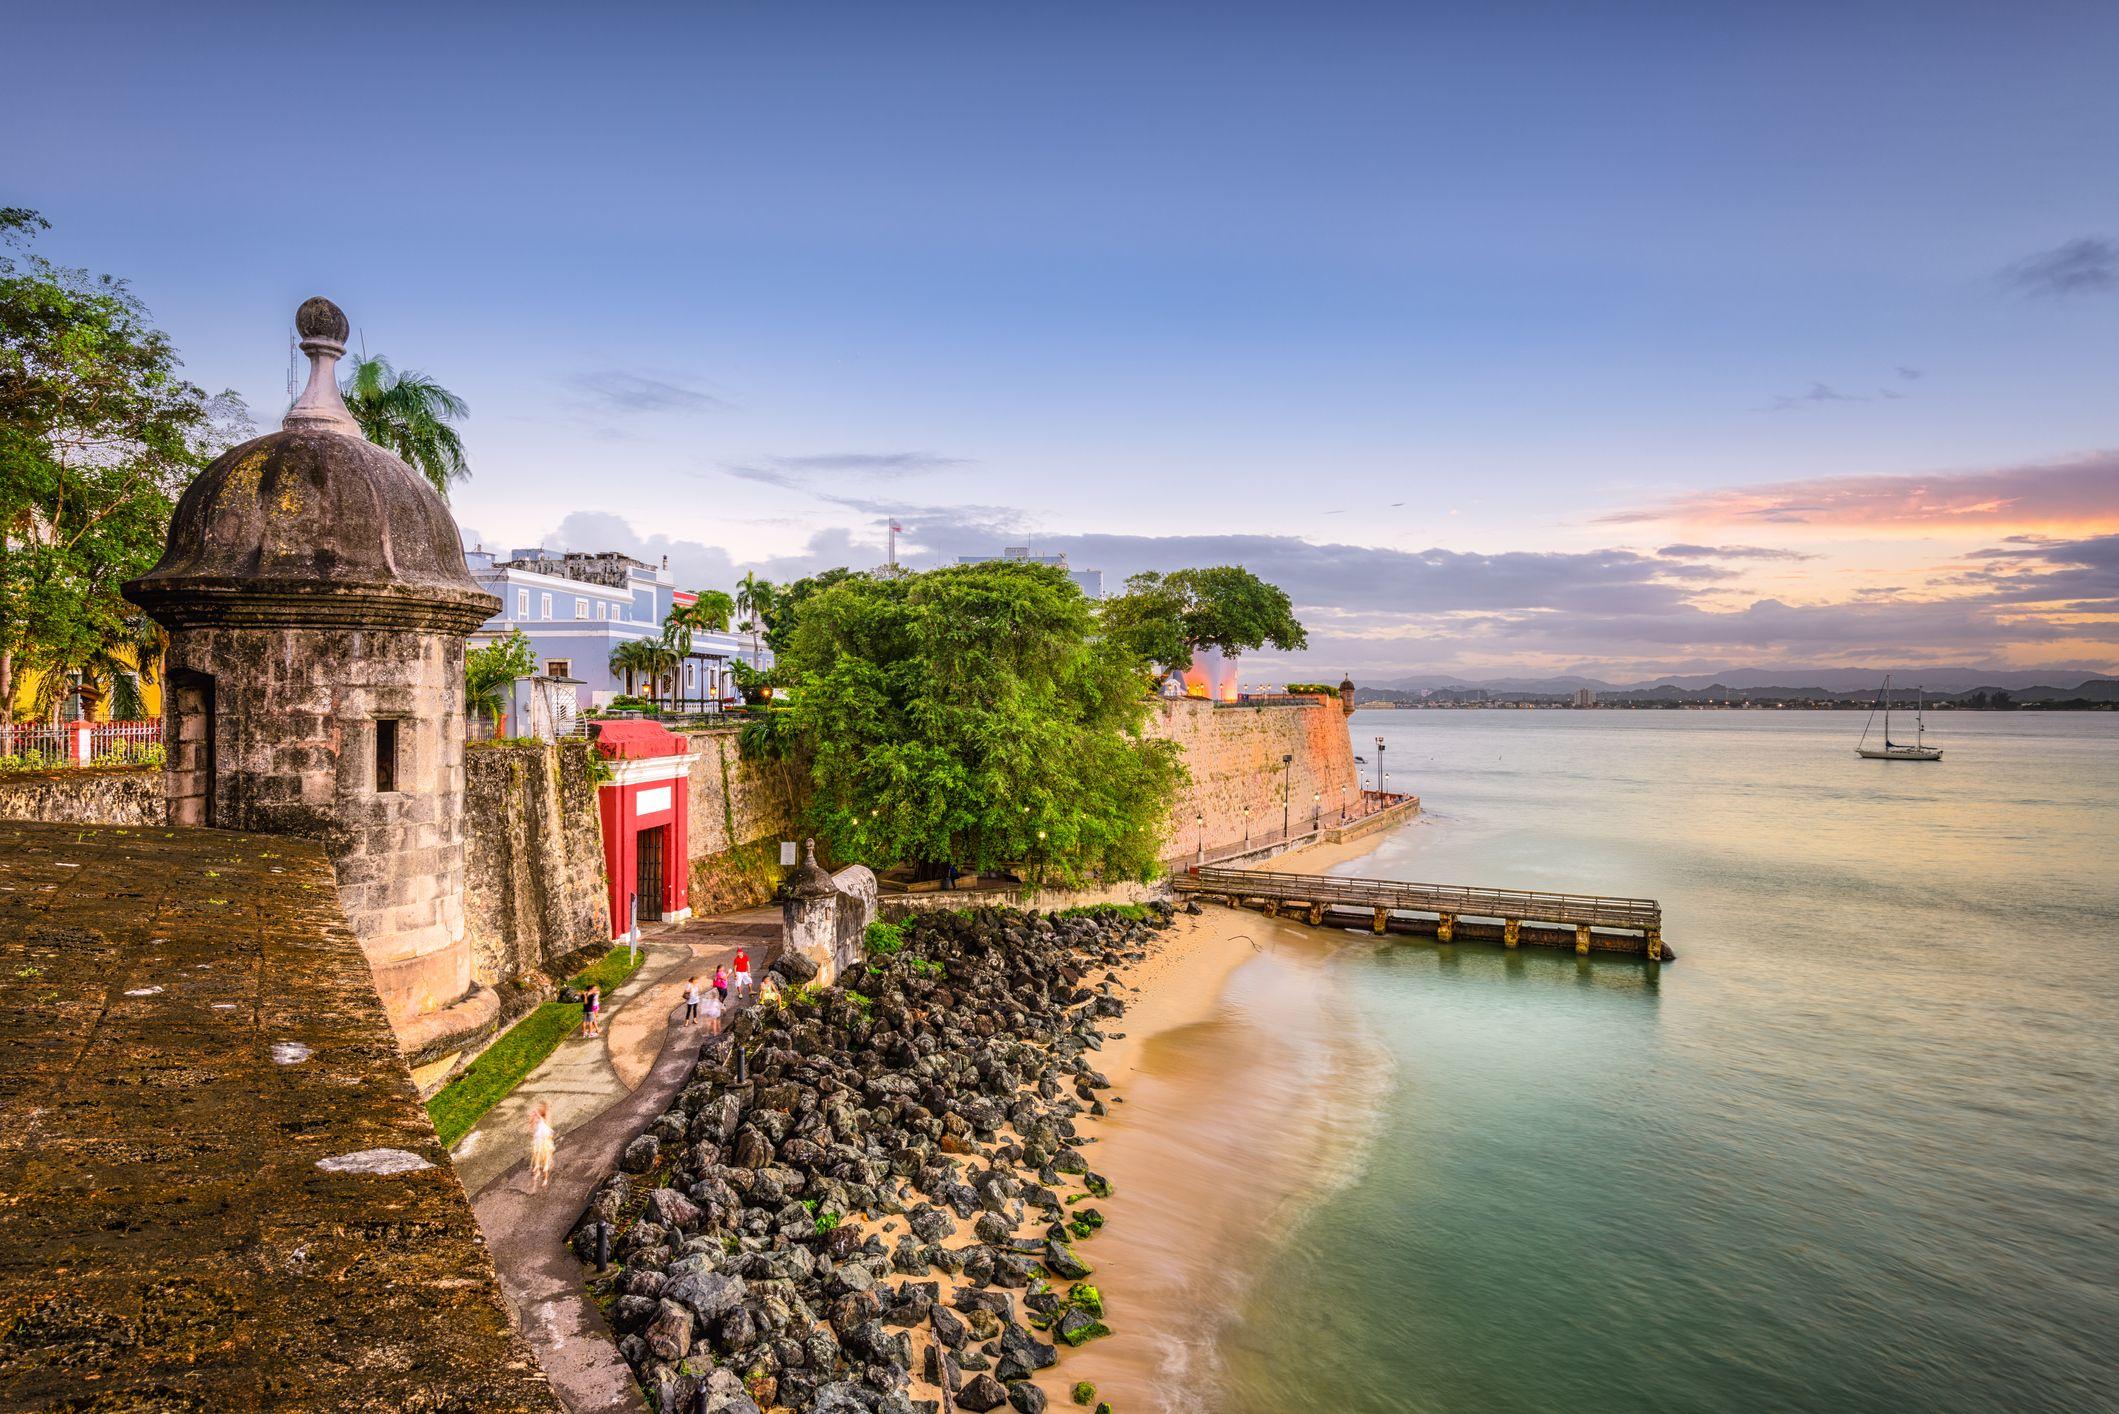 San Juan, Puerto Rico spring break airbnb